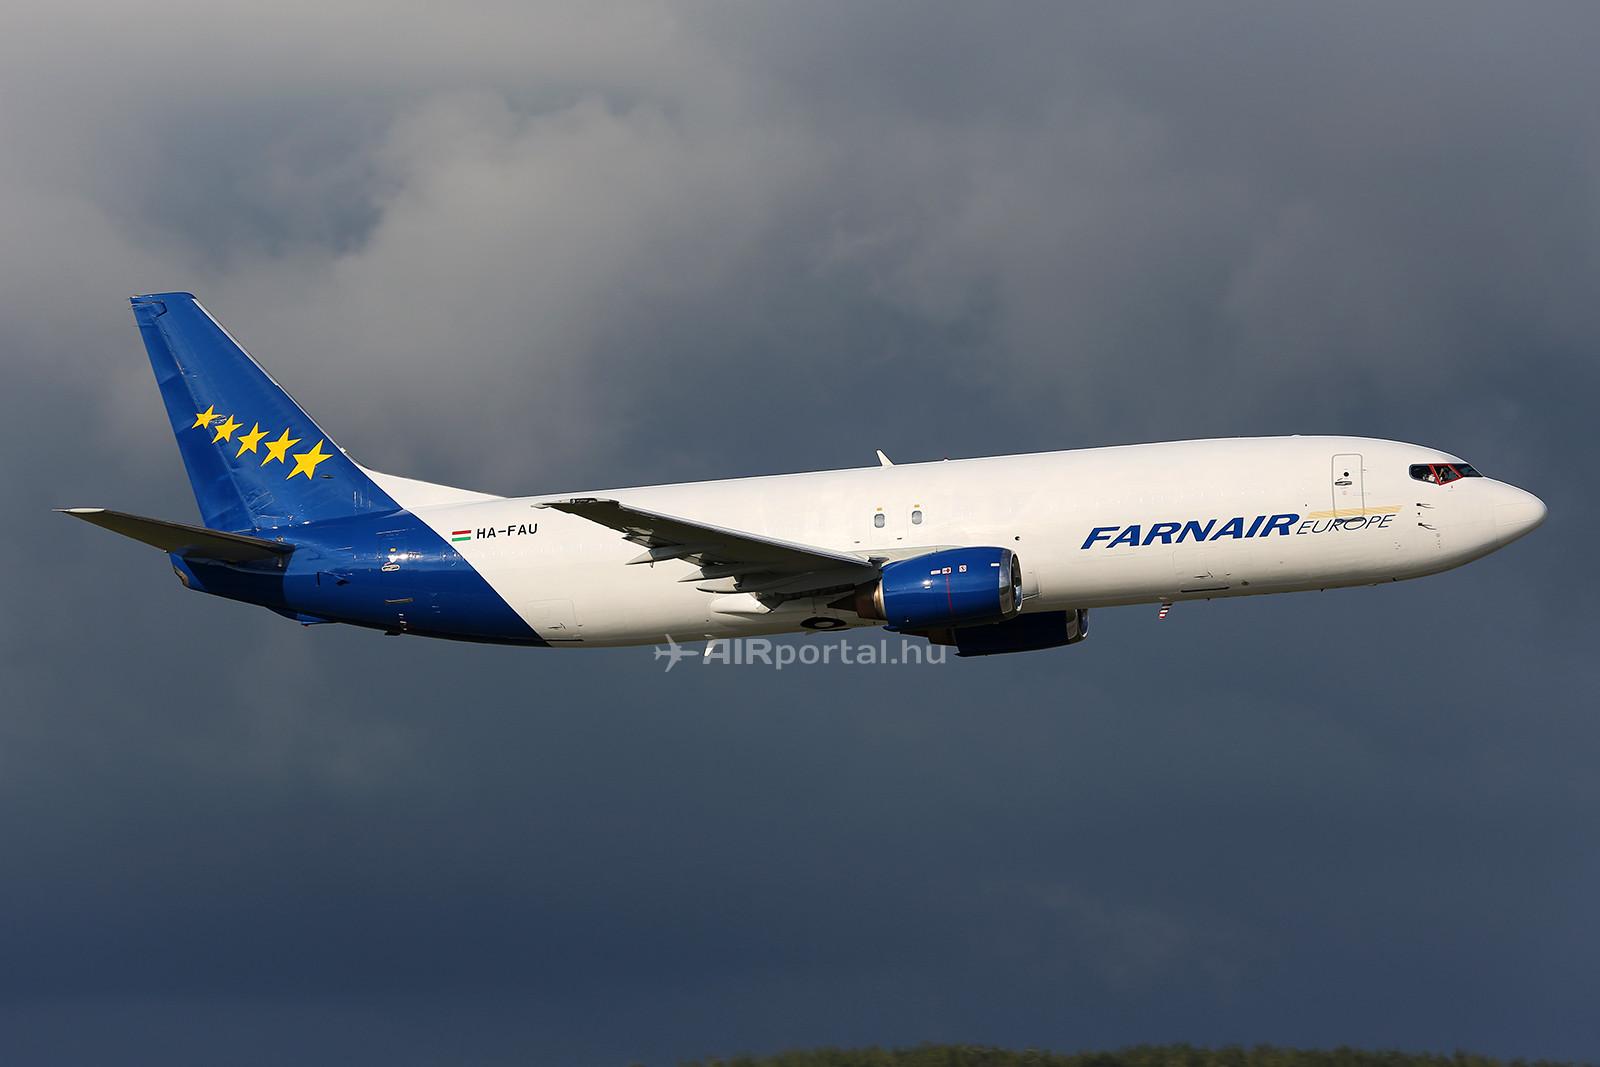 A Farnair Hungary Boeing 737-es repülőgépe. (Fotó: AIRportal.hu) | © AIRportal.hu